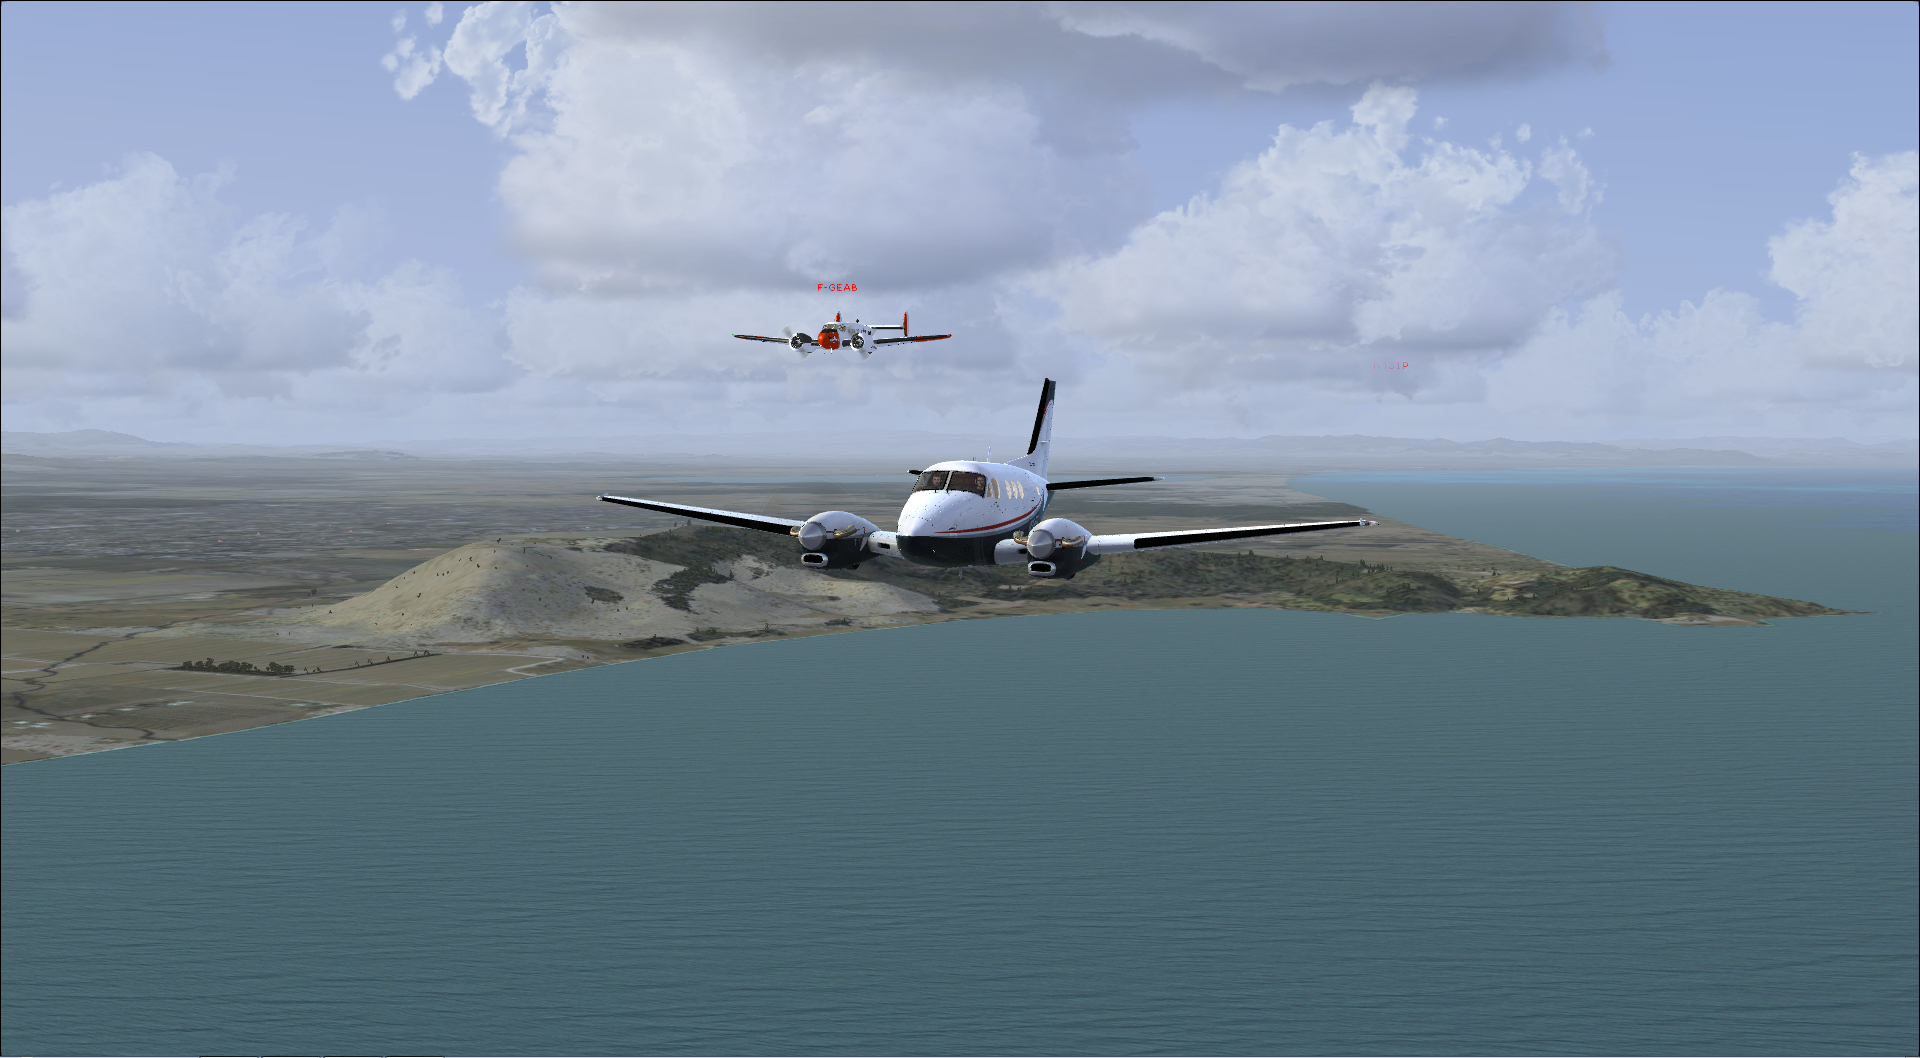 L'Aeropostale 2 eme etape 7229122013118224855177